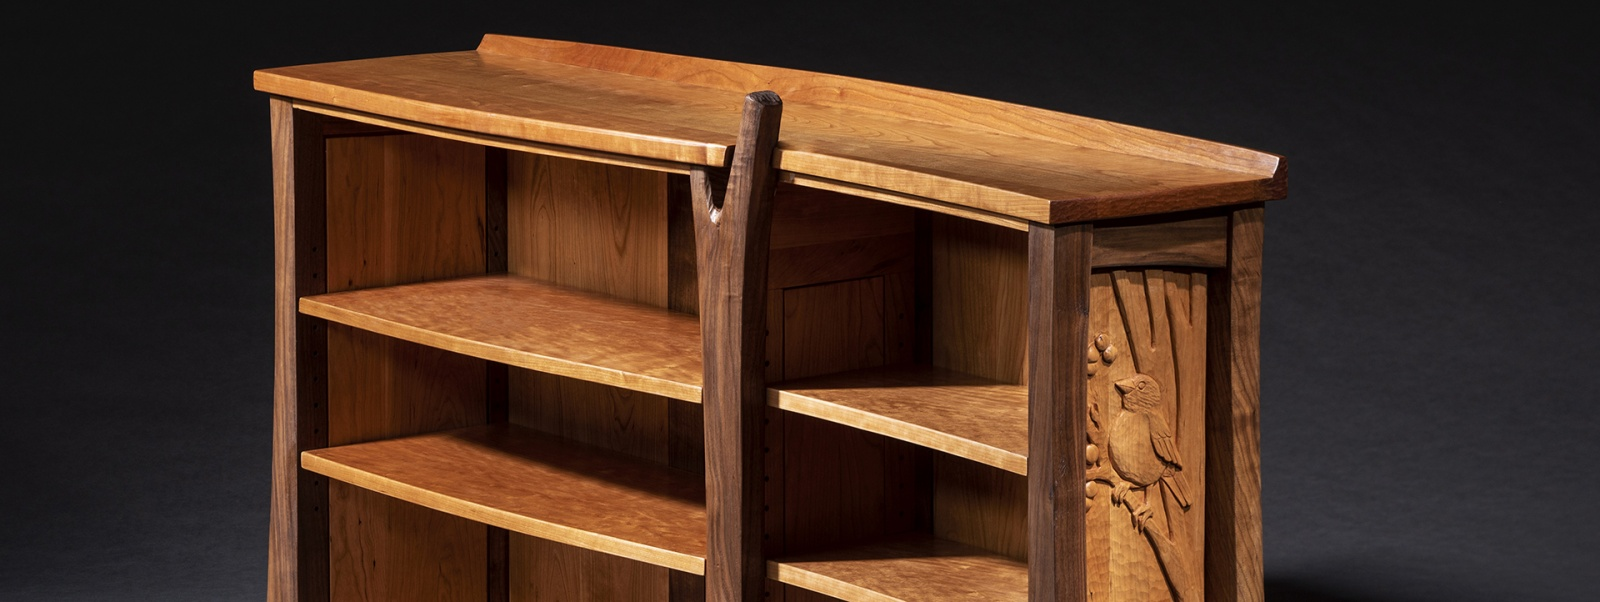 A bookshelf created by furniture master Jeffrey Cooper